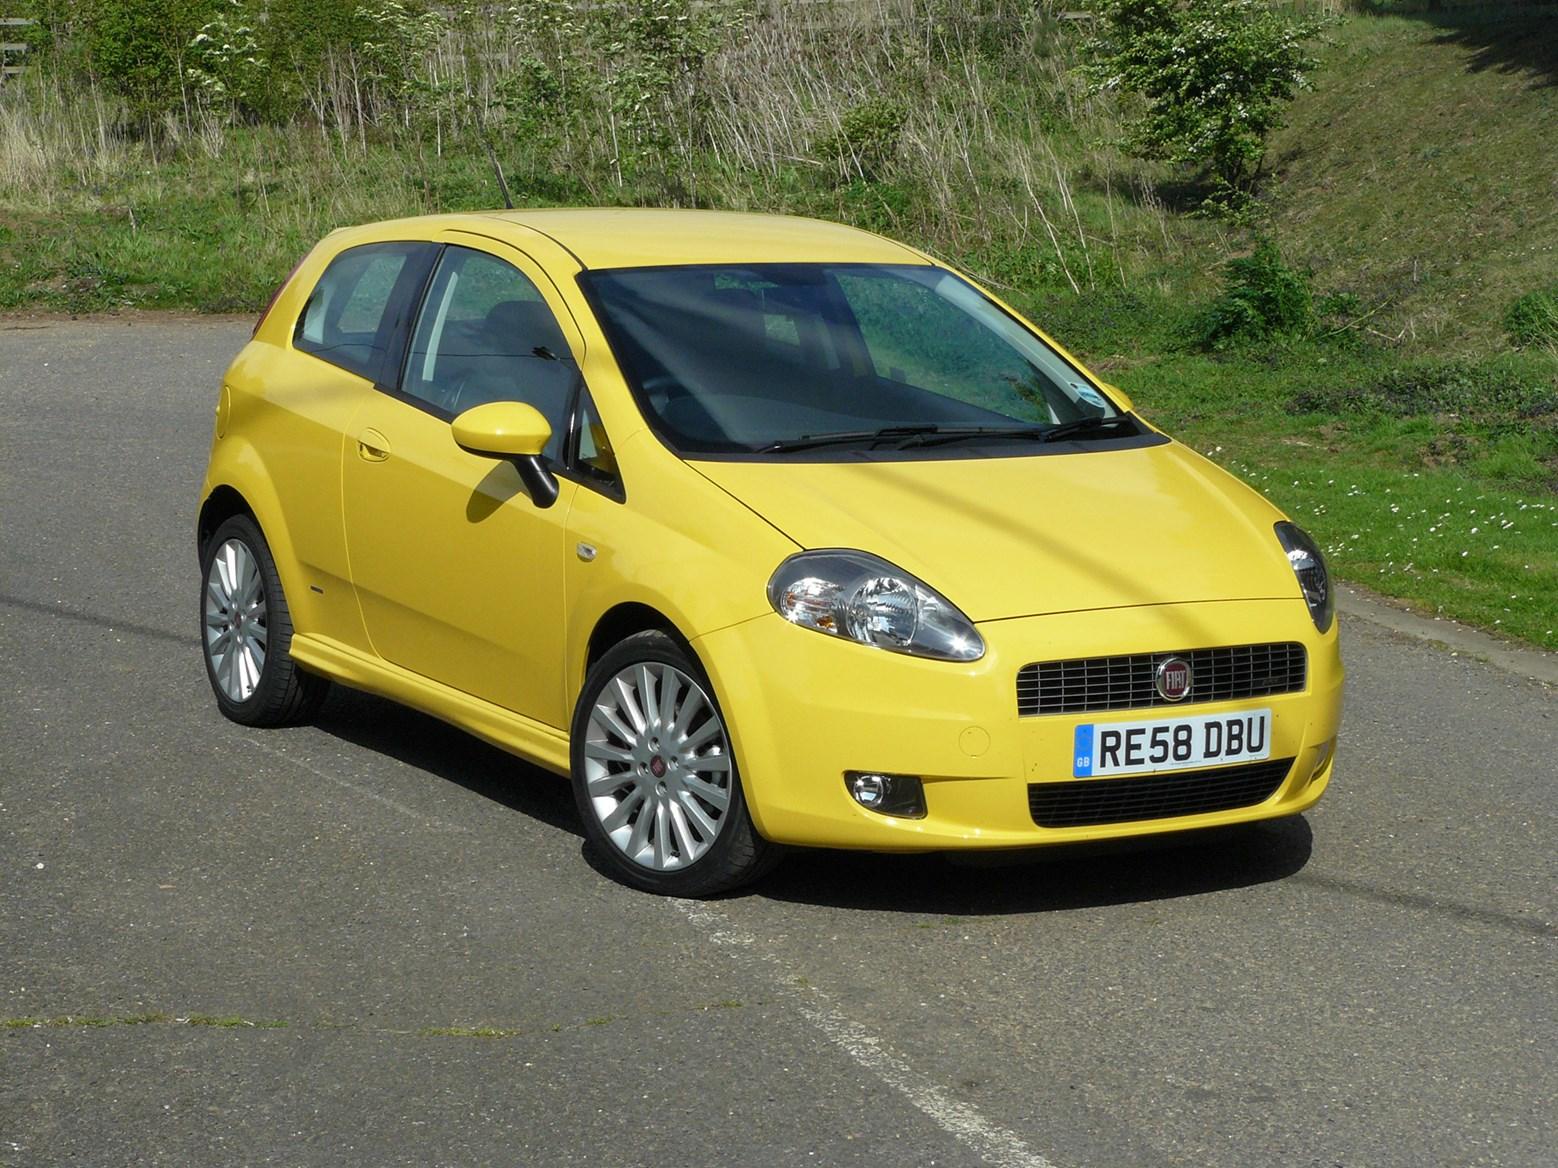 Fiat Grande Punto Hatchback Review (2006 - 2010) | Parkers on fiat linea, fiat seicento, fiat doblo, fiat stilo, fiat 500 turbo, fiat bravo, fiat panda, fiat x1/9, fiat 500 abarth, fiat coupe, fiat cars, fiat 500l, fiat marea, fiat spider, fiat cinquecento, fiat multipla, fiat ritmo, fiat barchetta,